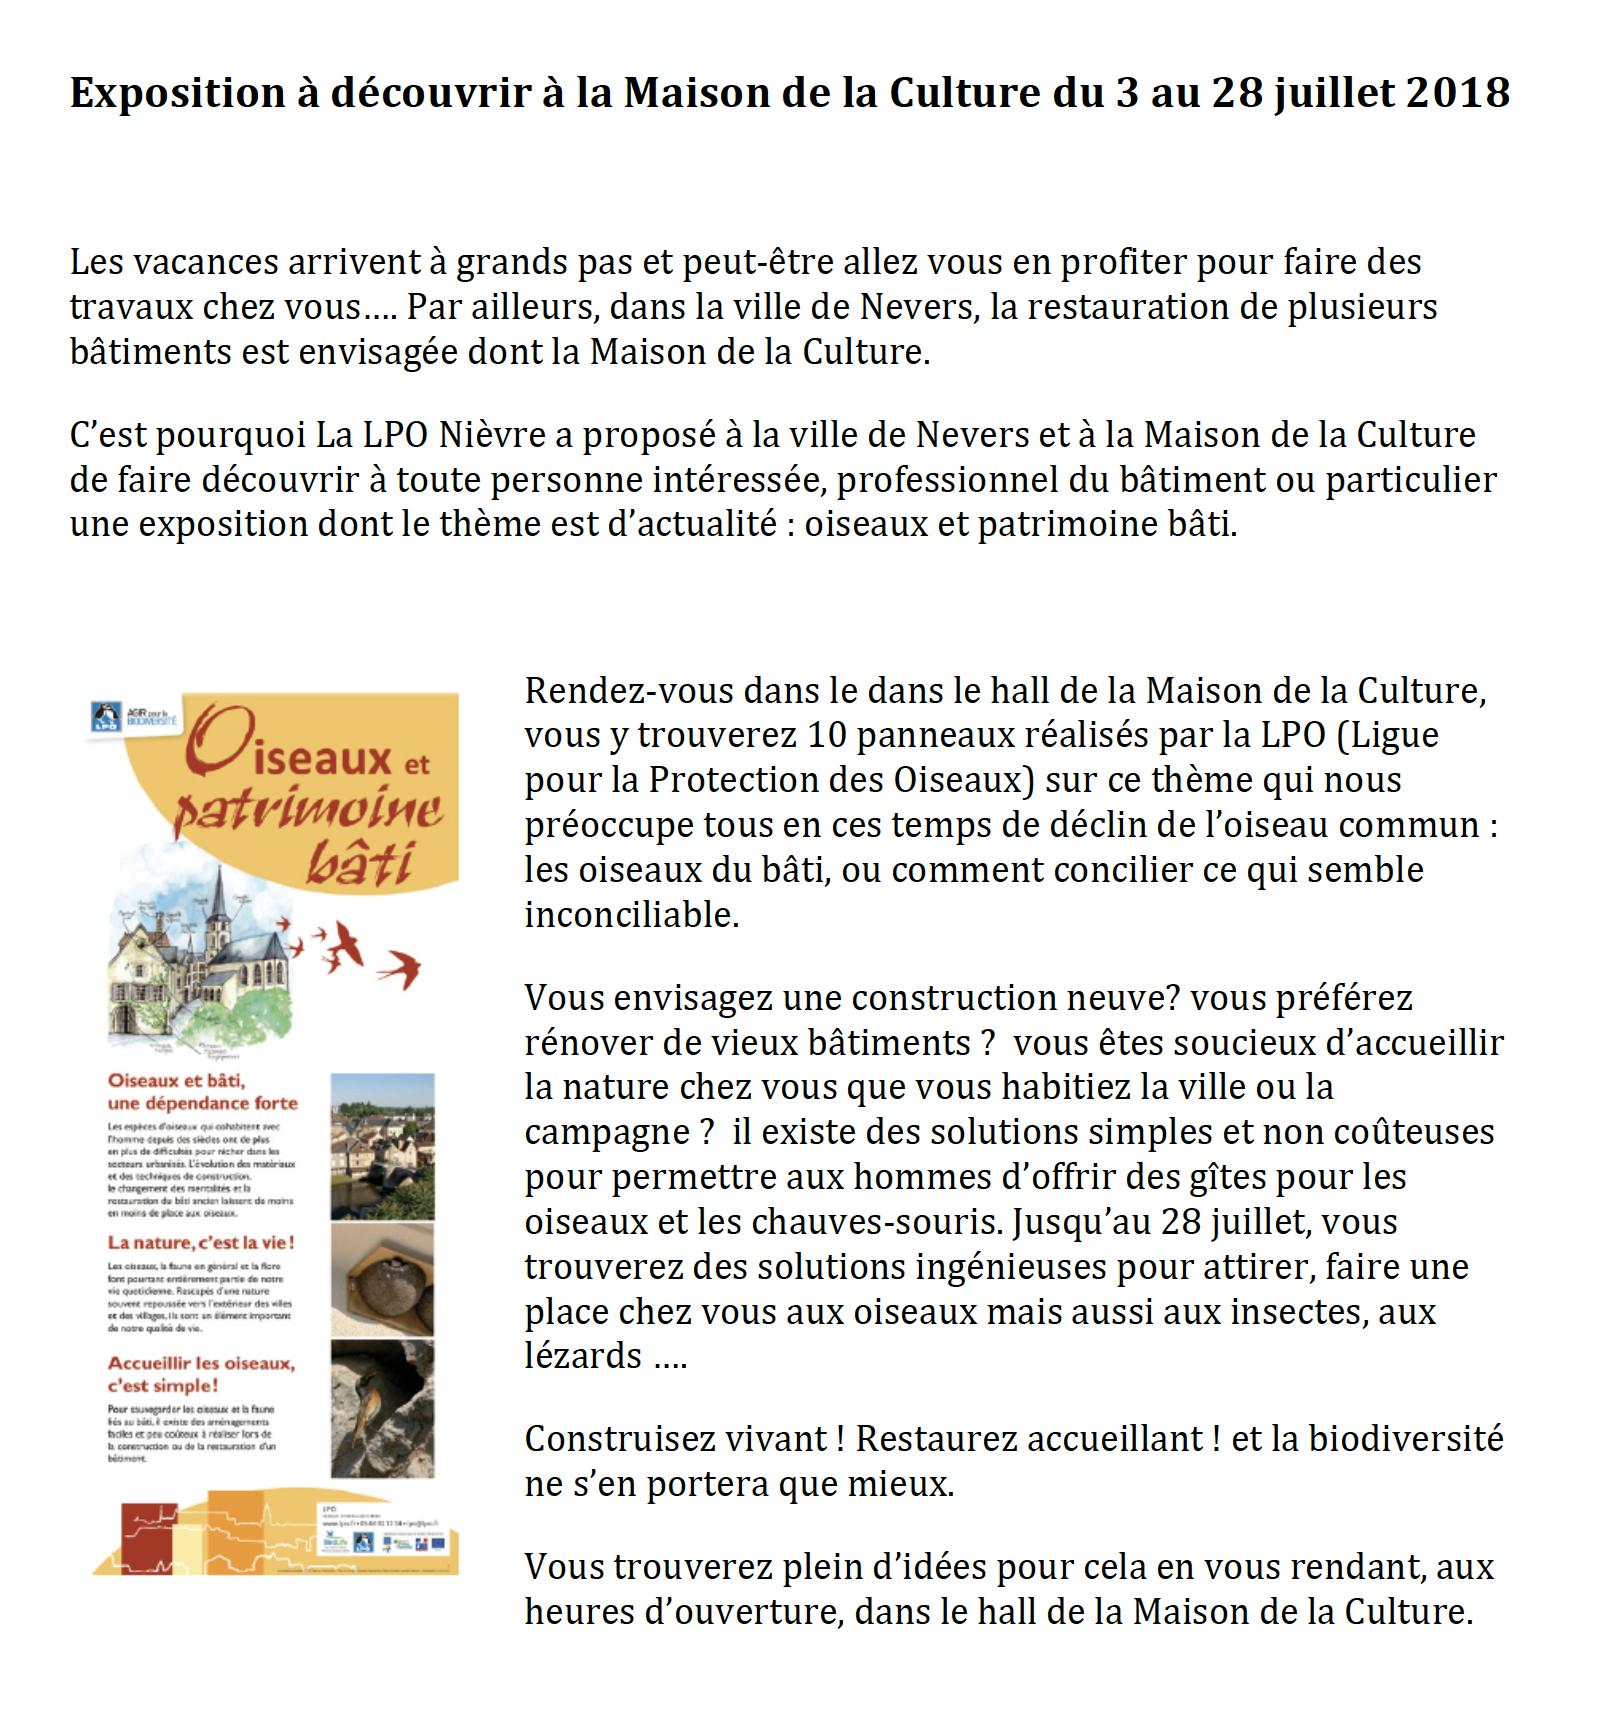 http://files.biolovision.net/www.faune-nievre.org/userfiles/Expooiseauetpatrimoinebati.png